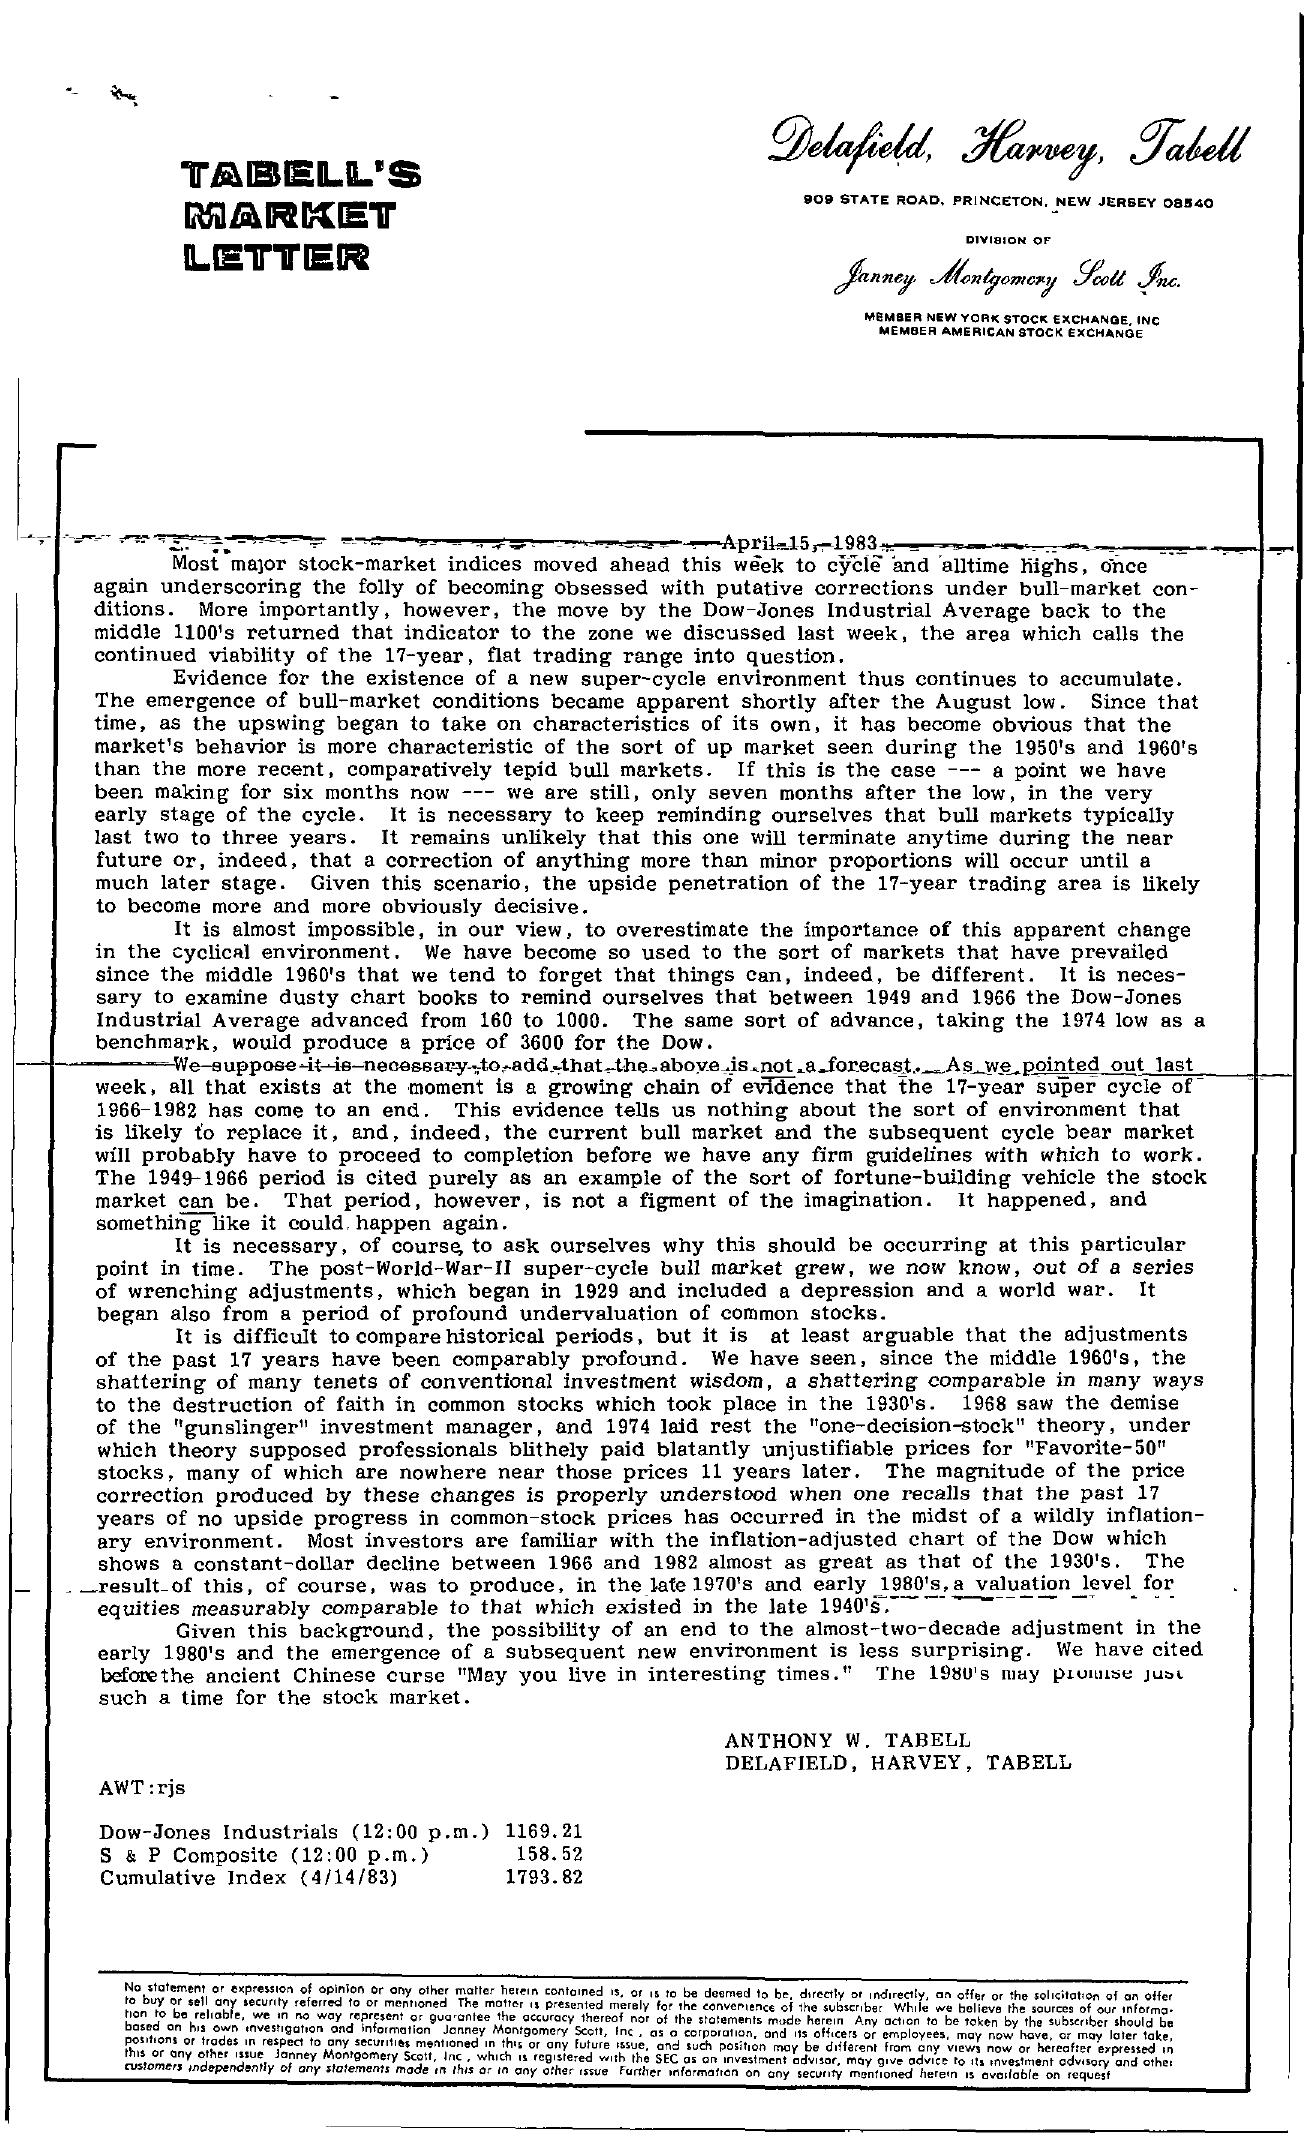 Tabell's Market Letter - April 15, 1983